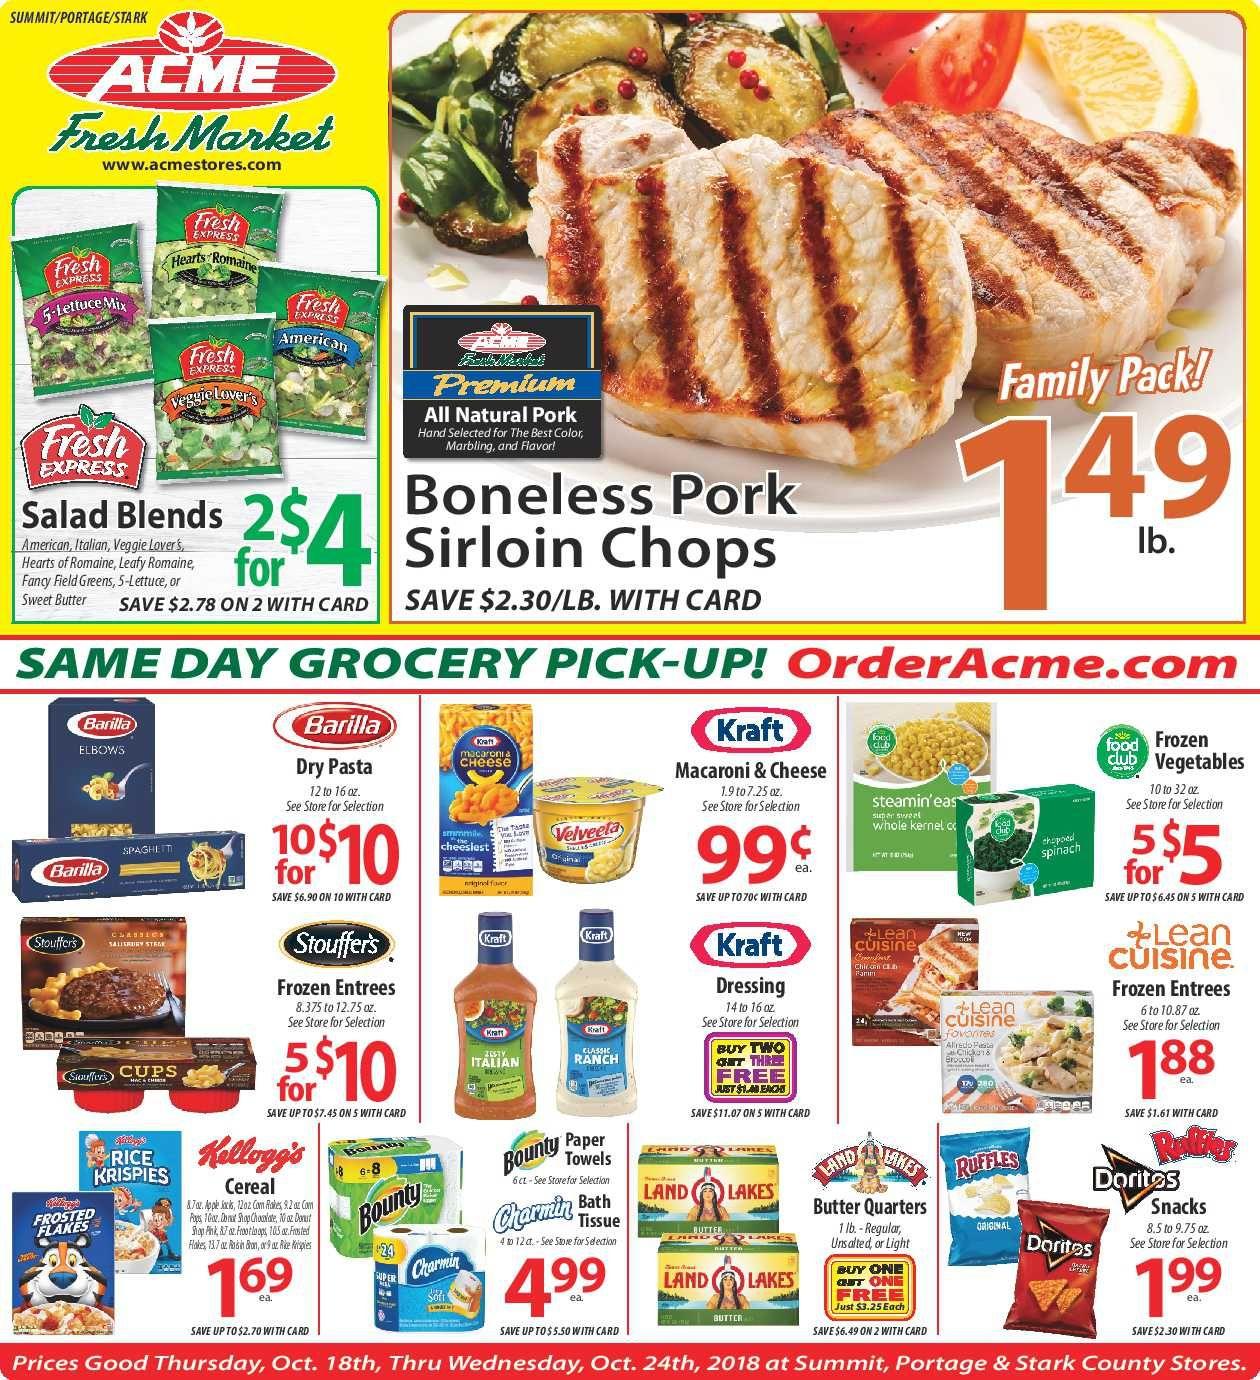 Acme fresh market weekly specials flyer january 17 23